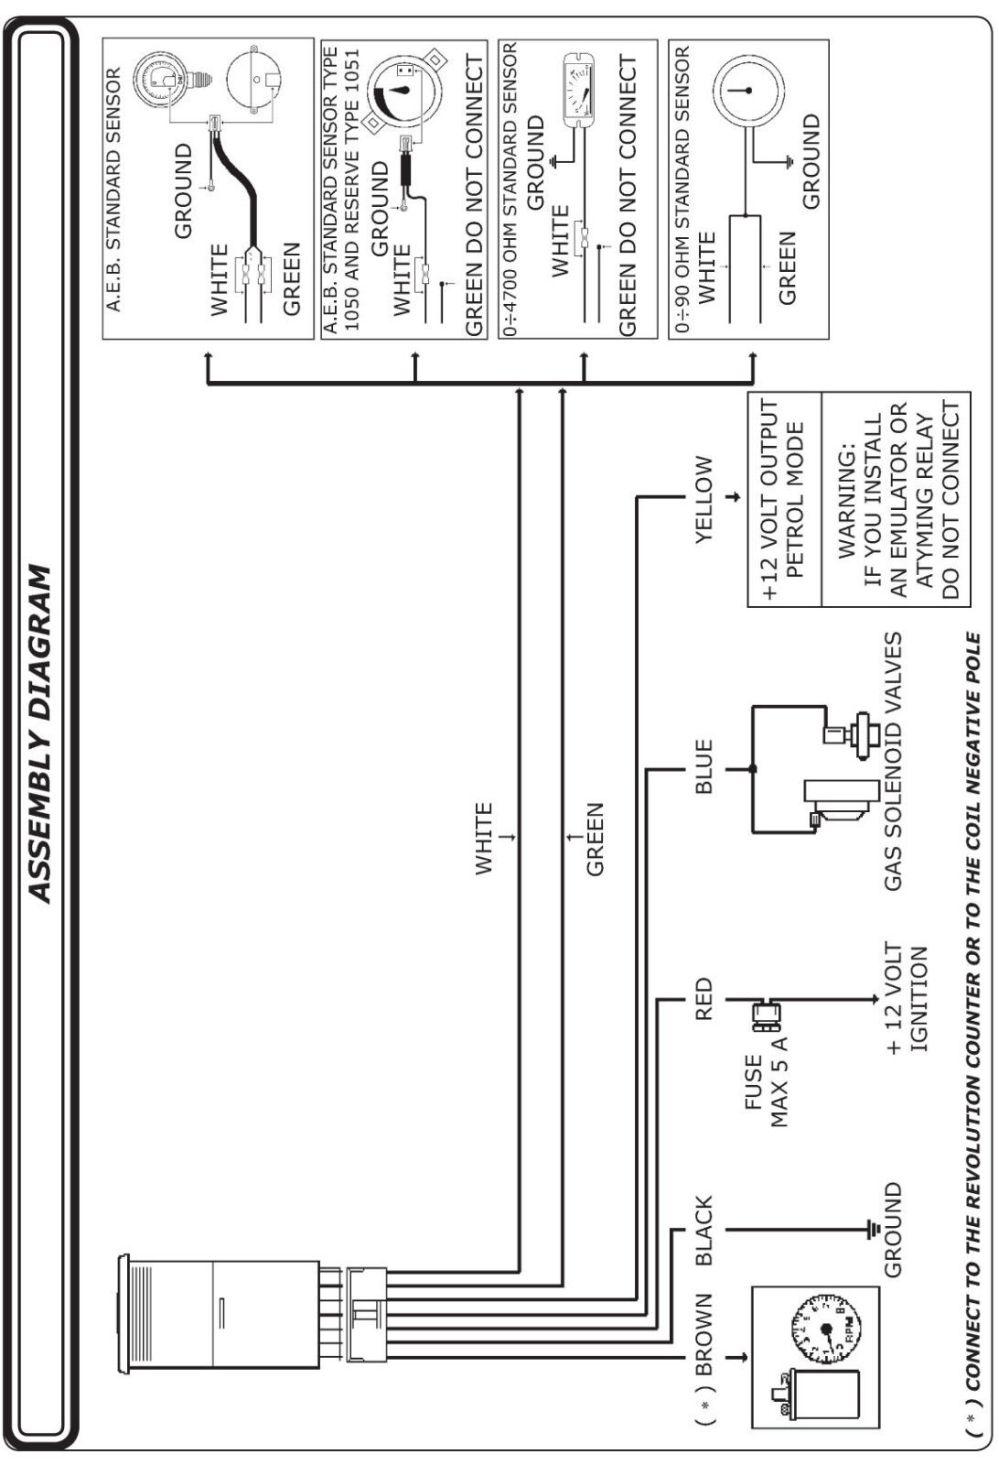 medium resolution of car lpg wiring diagram wiring library car lpg wiring diagram